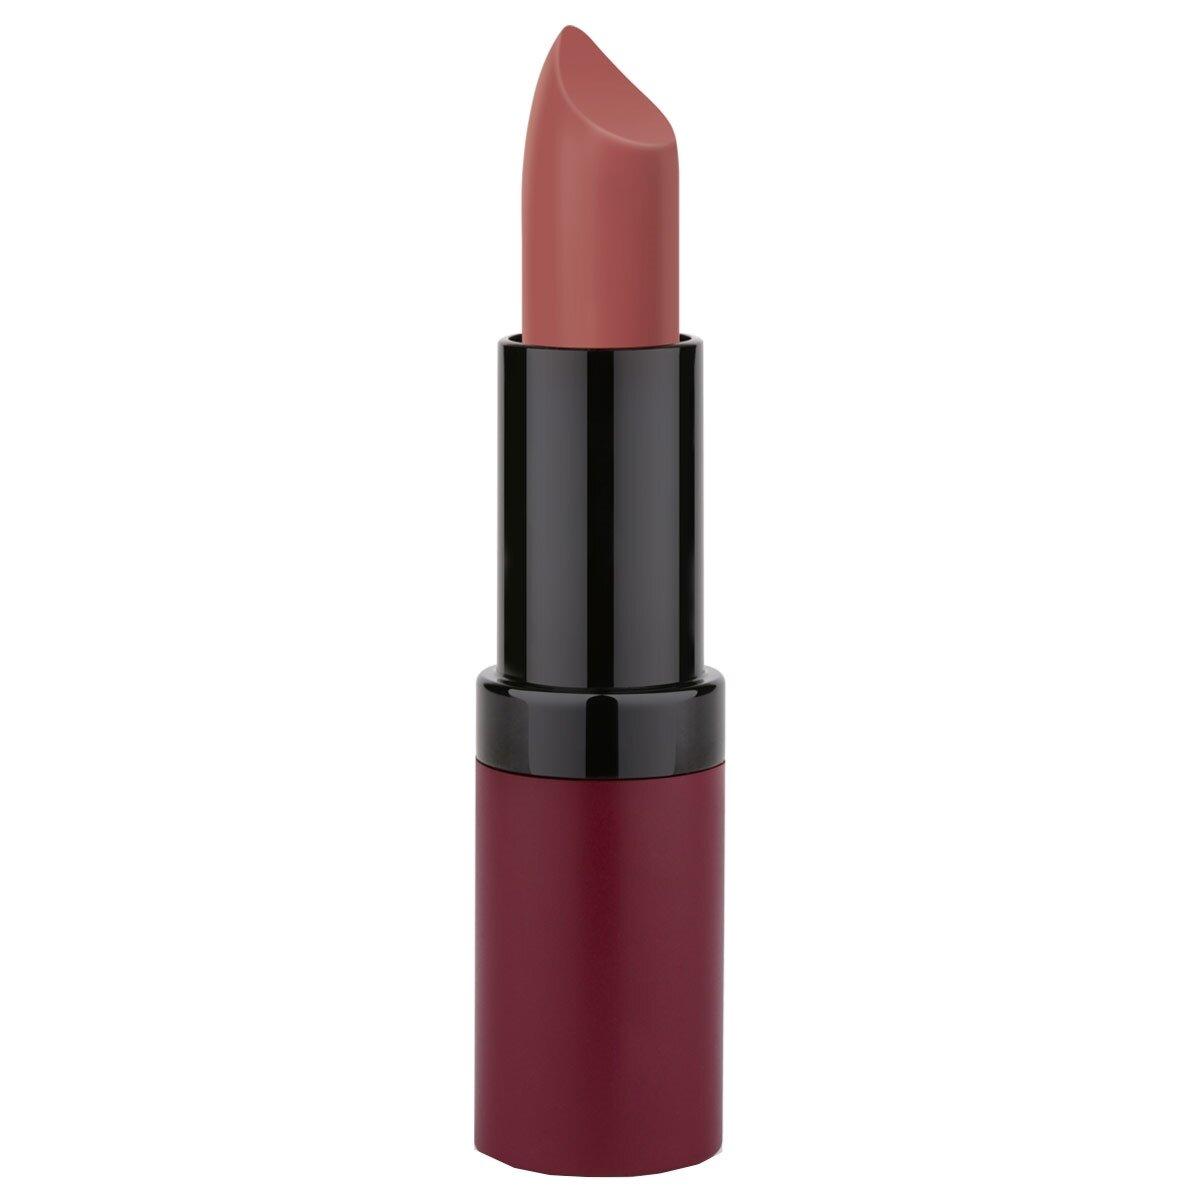 Velvet Matte Lipstick Ruj No 16 Golden Rose Watsons